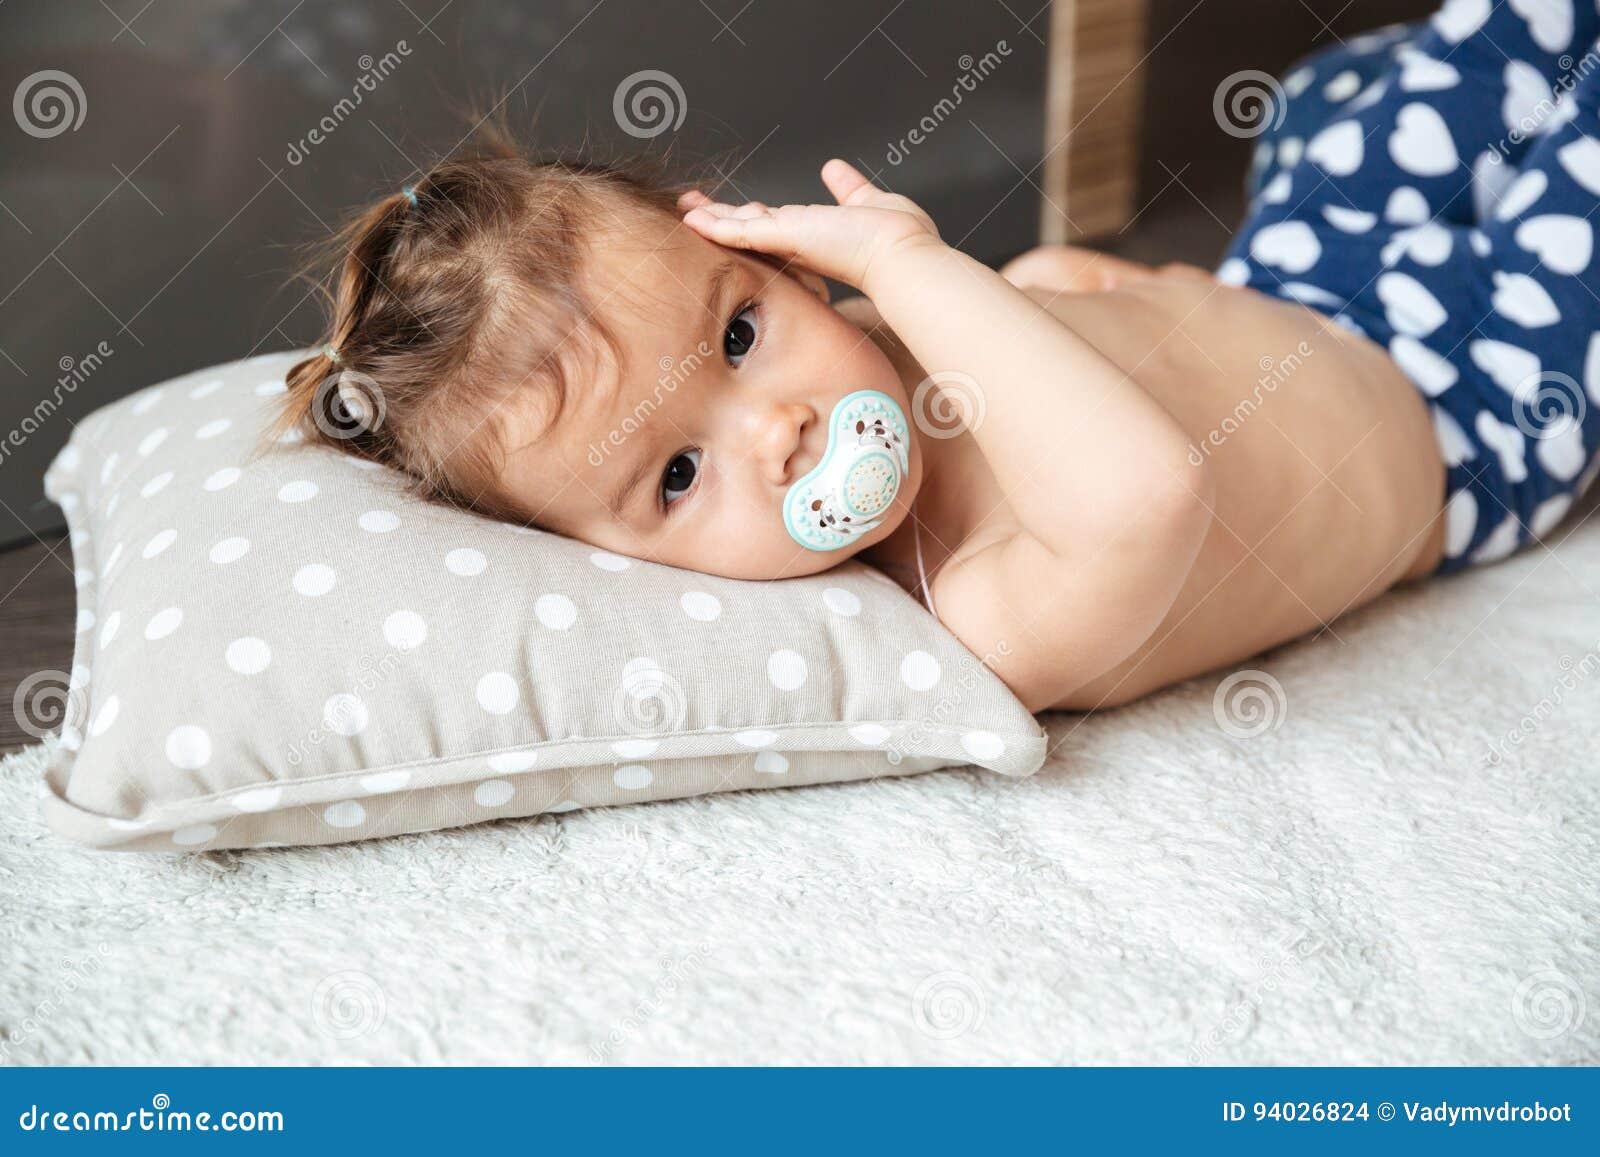 Little girl nipple Royalty-Free Stock Photo